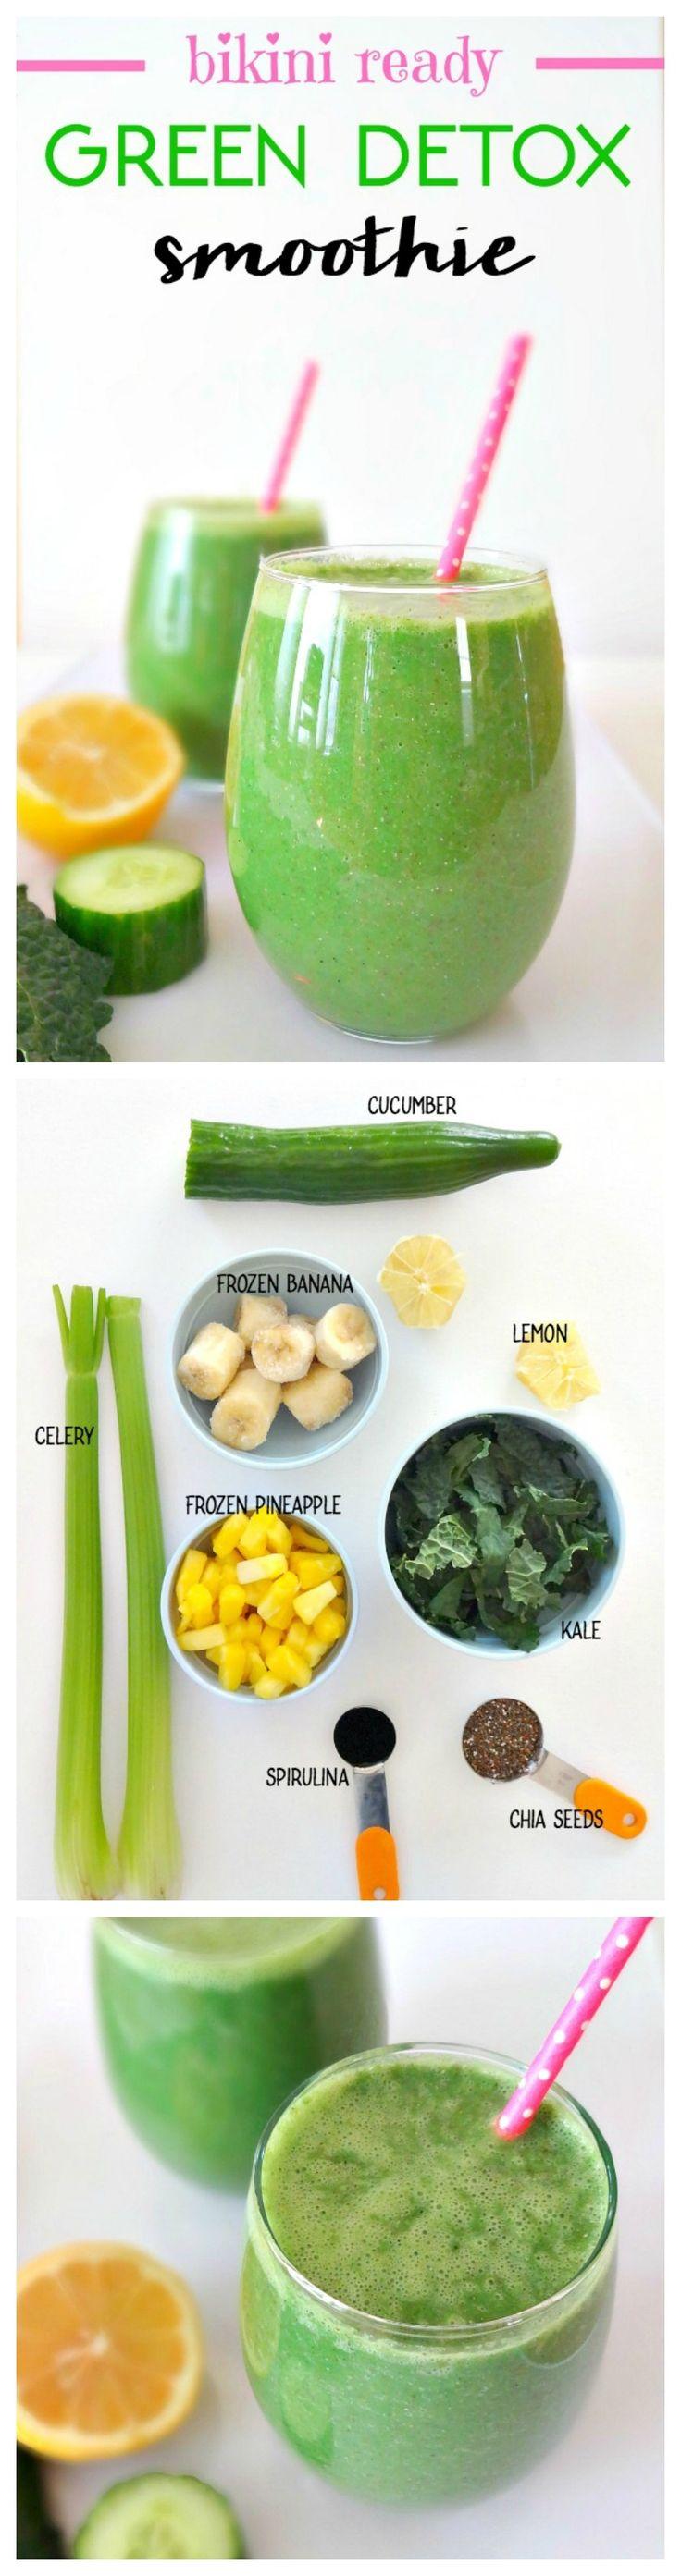 Green Detox Smoothie: - 1 pepino - 1 banana congelada - 1 limu00f3n - 2 apios - Piu00f1a congelada - Col rizada - Spirulina - Chia seeds #weightlossbeforeandafter